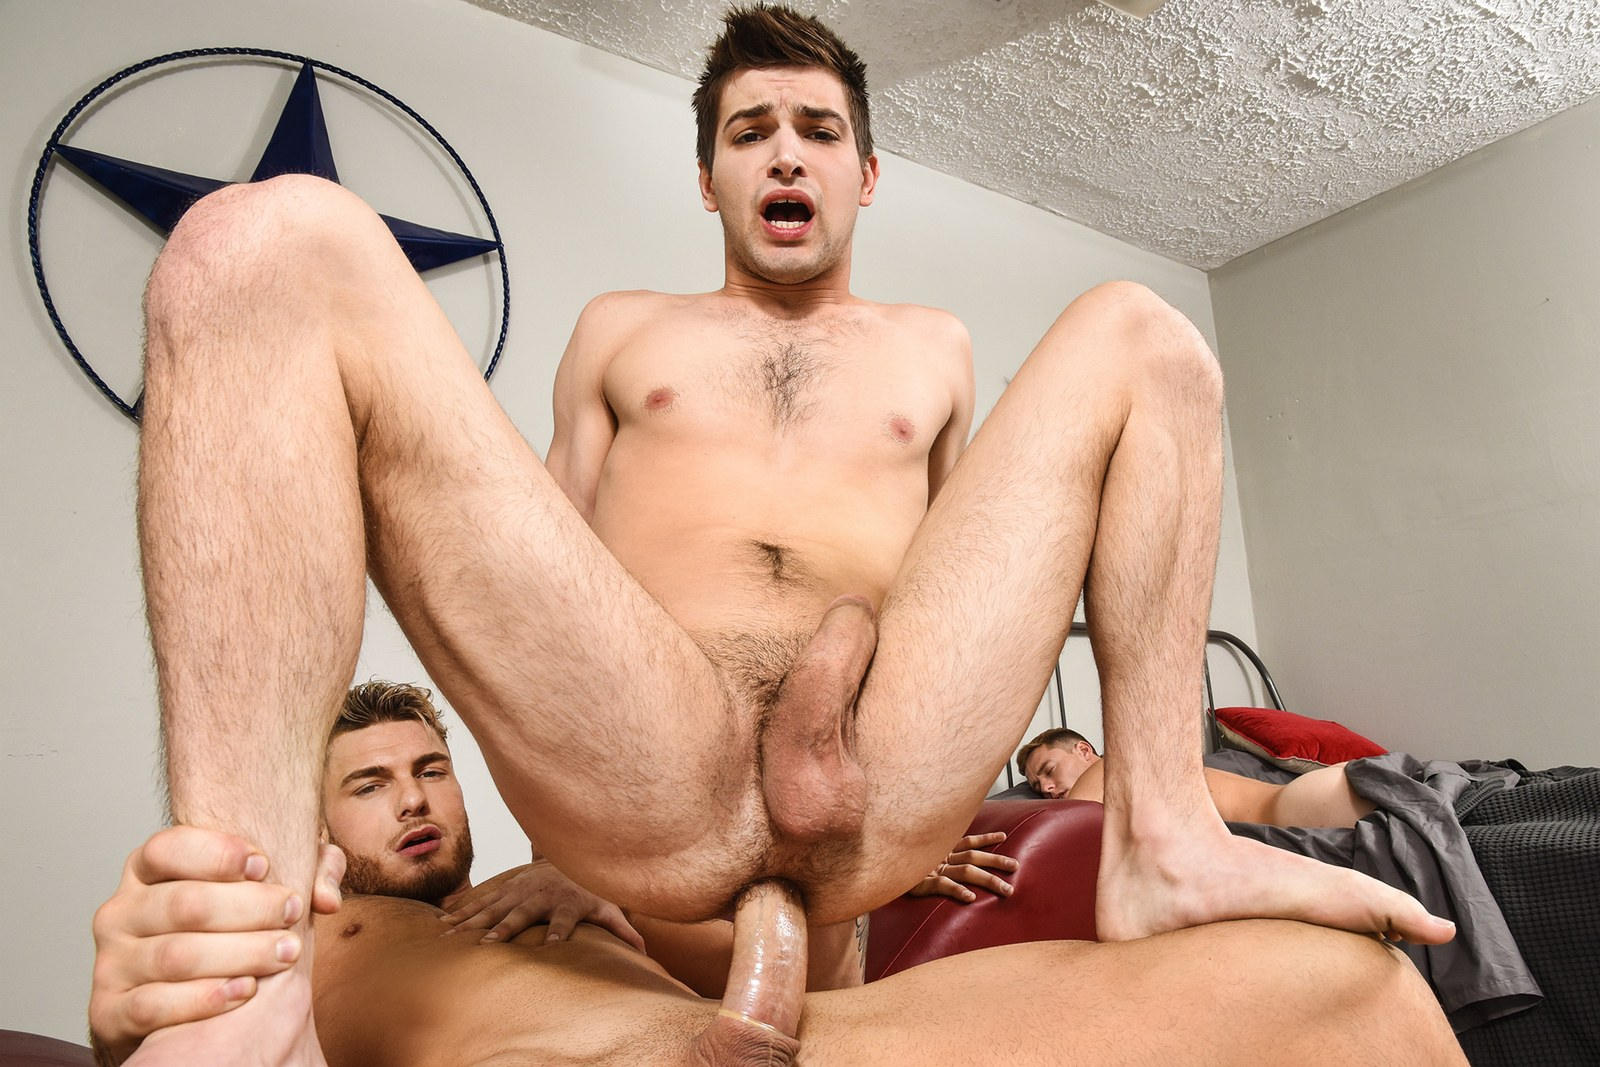 Gay porn stars hardcore fucking